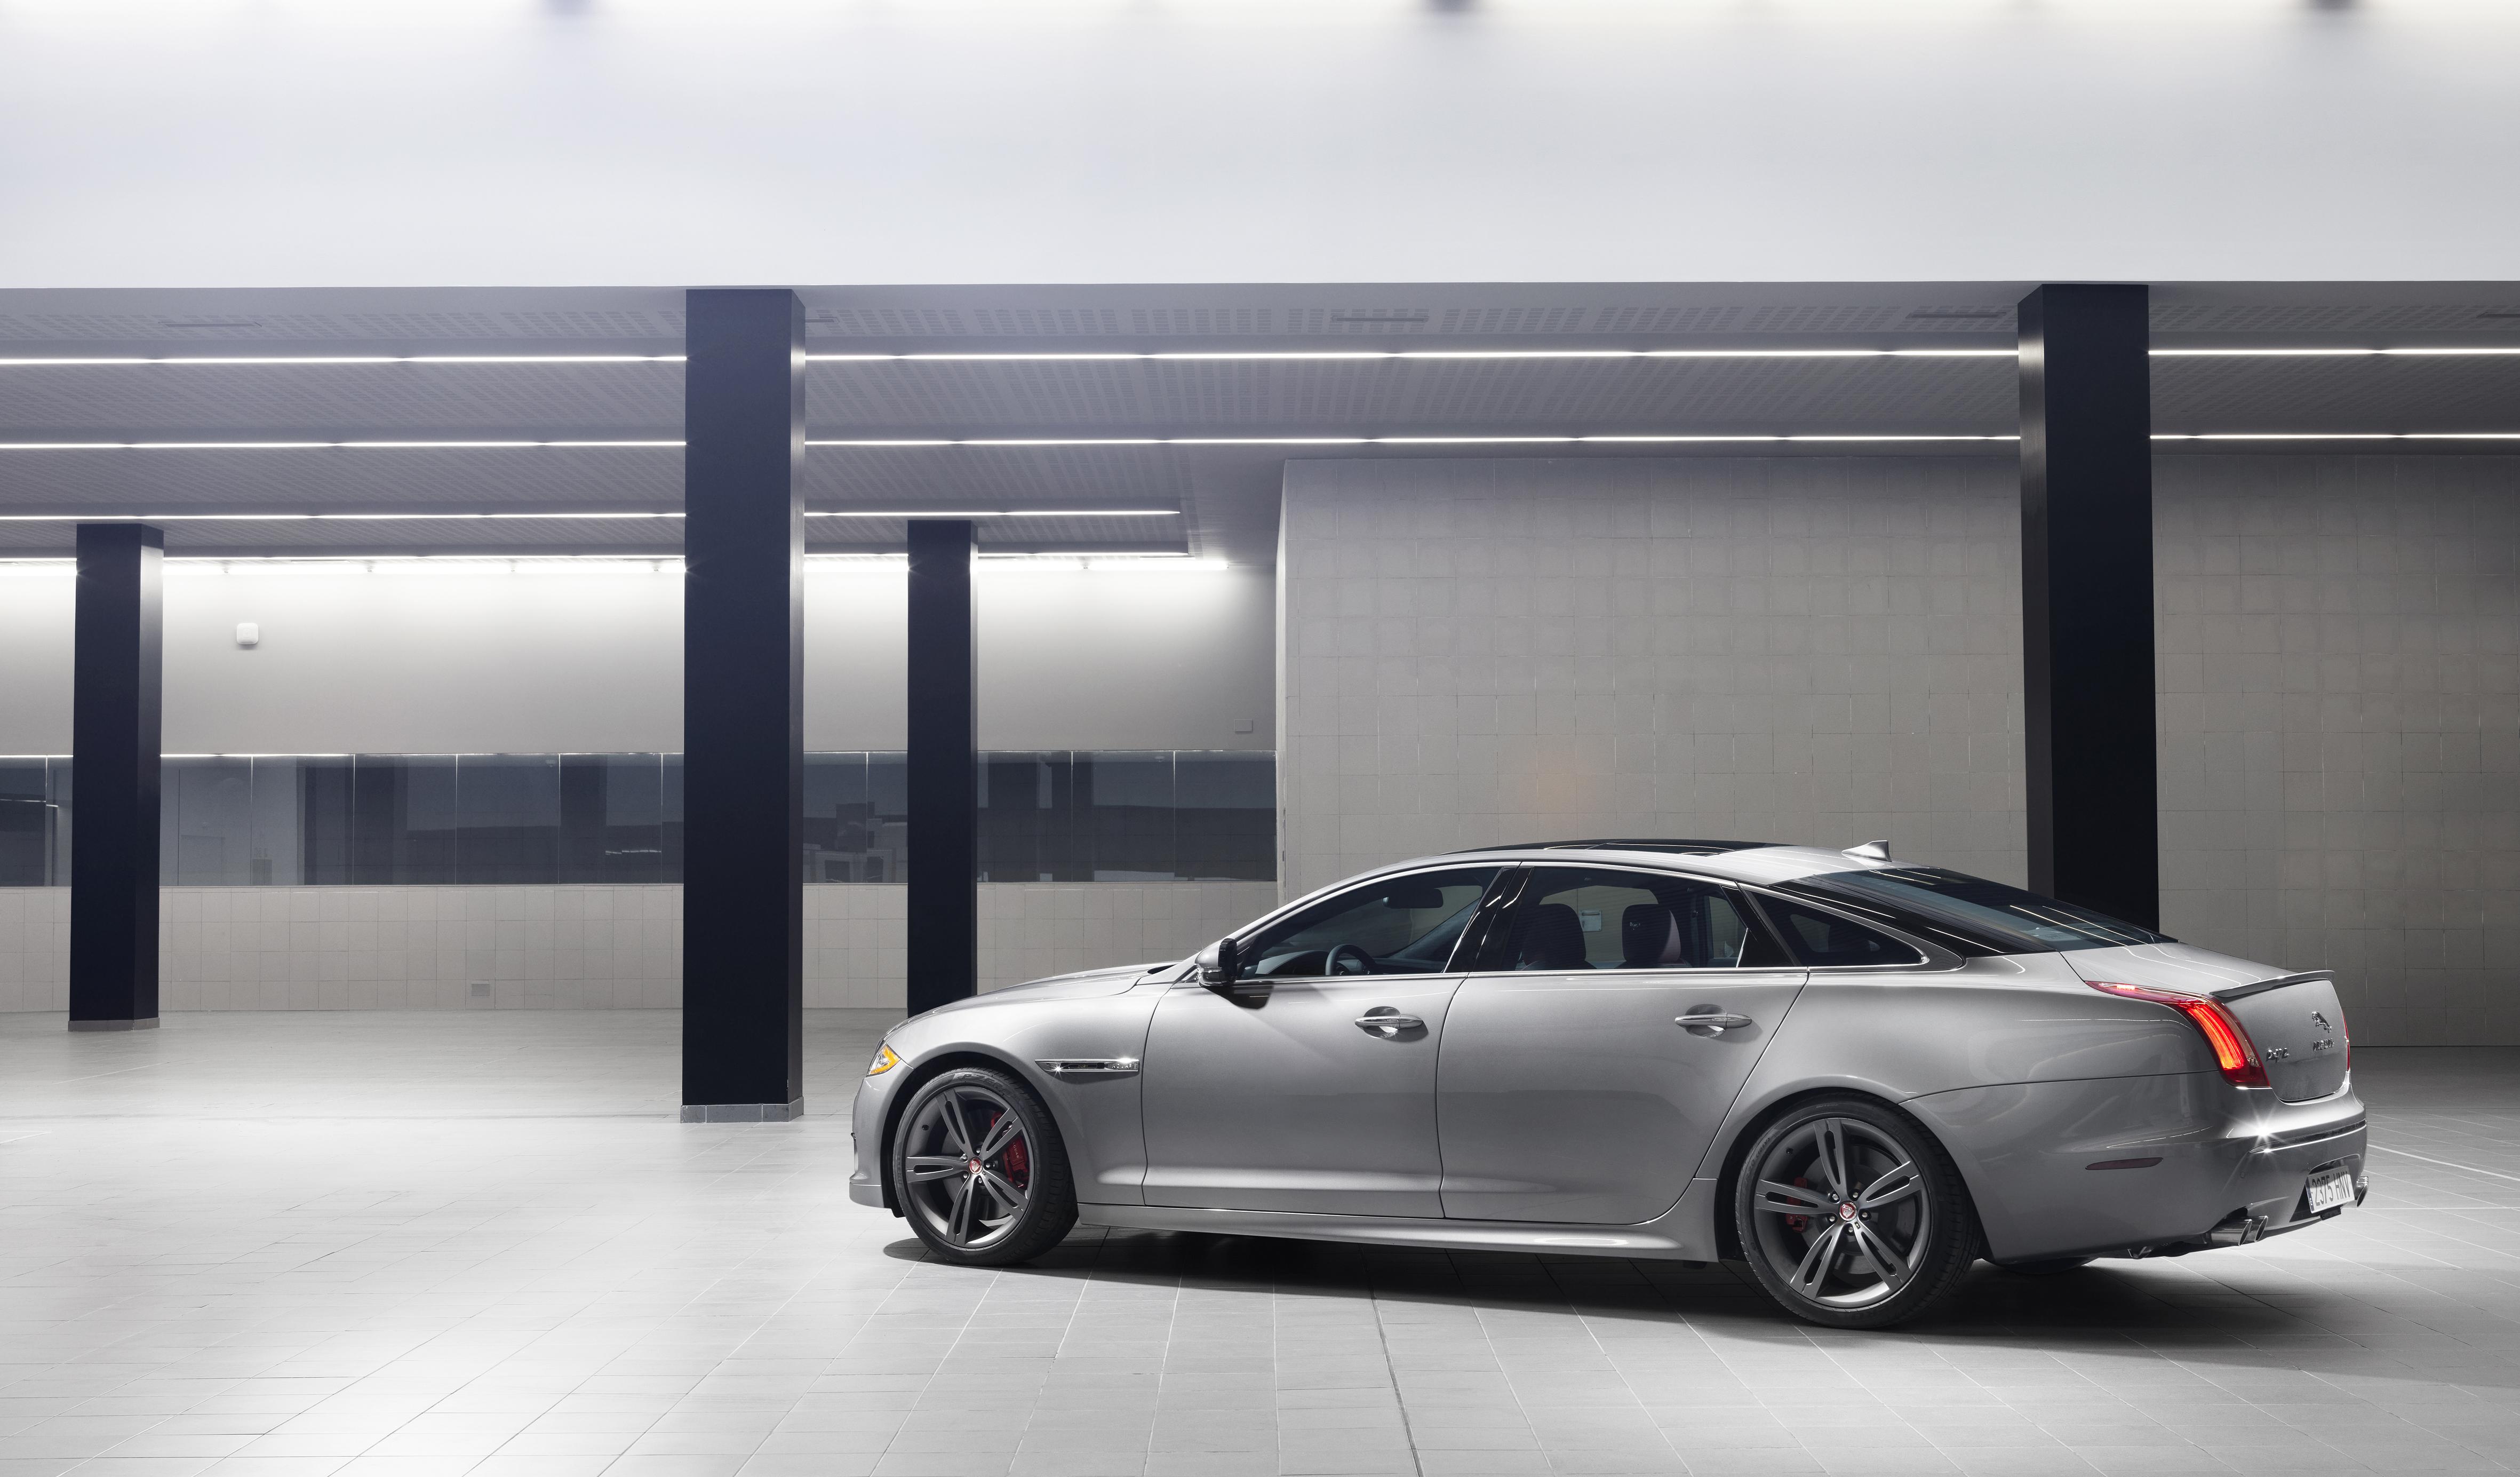 xjl bcnster m supersport auto awd luxury xj jaguar mai cars premium kompressor sedan supercharger frontansicht